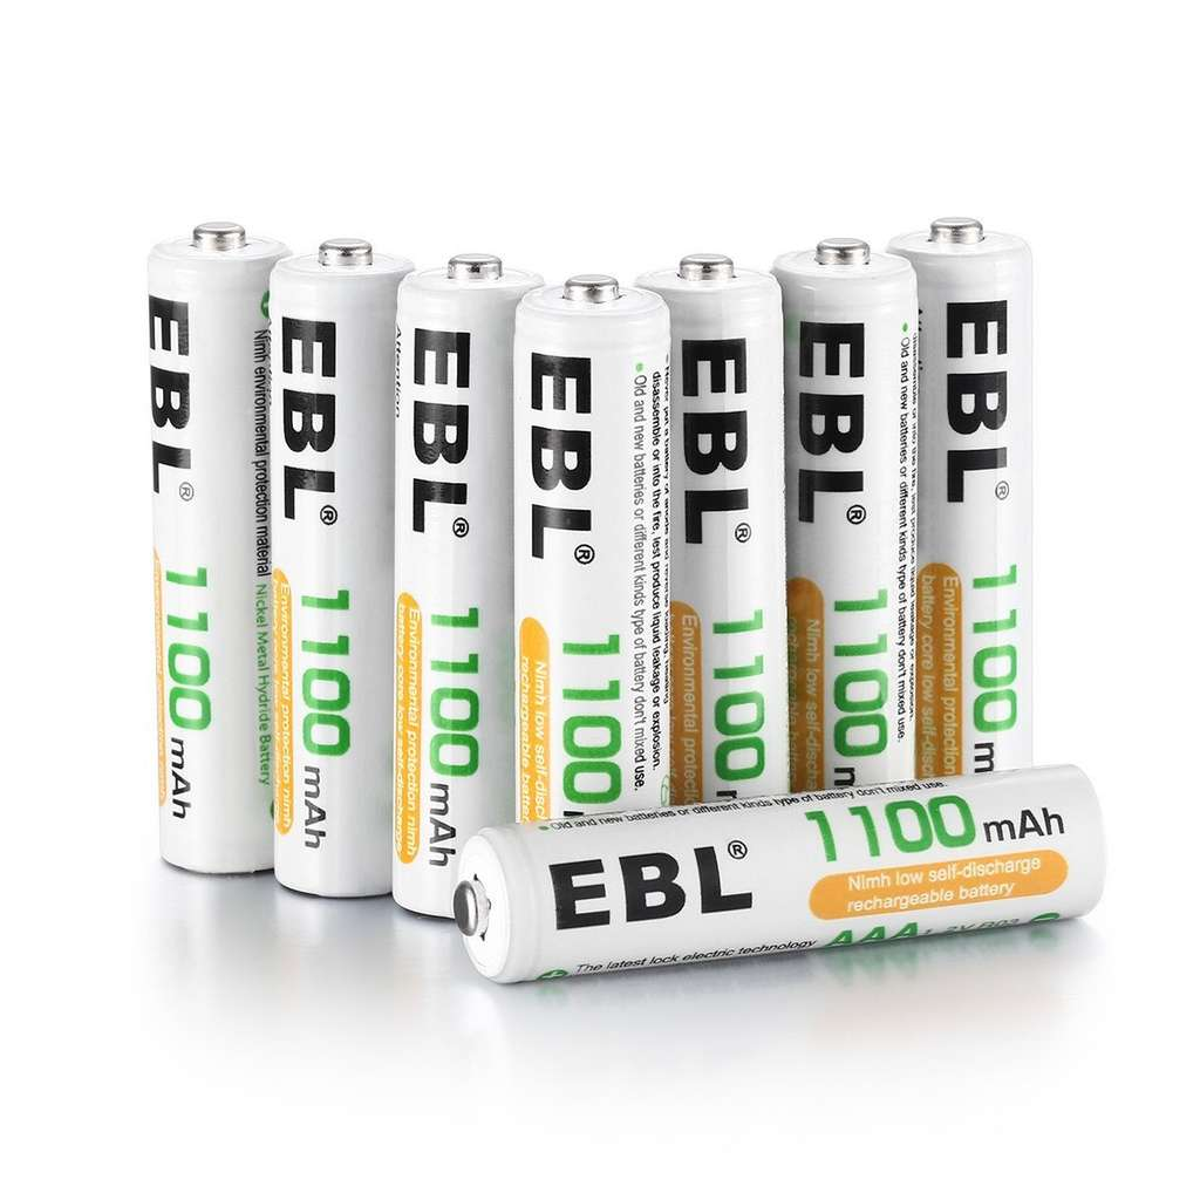 8 piles rechargeables ebl aaa 1100mah vendeur tiers. Black Bedroom Furniture Sets. Home Design Ideas